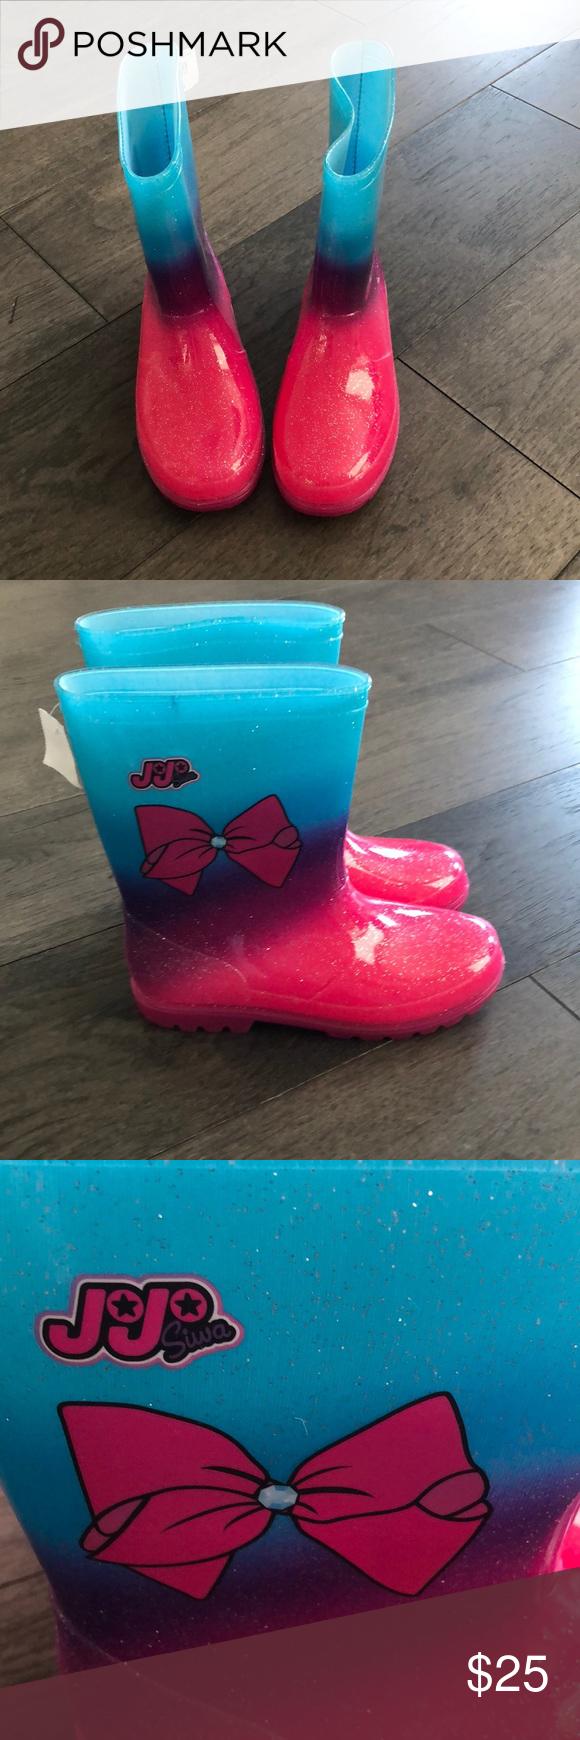 Jojo Siwa Nickelodeon girl's rain boots